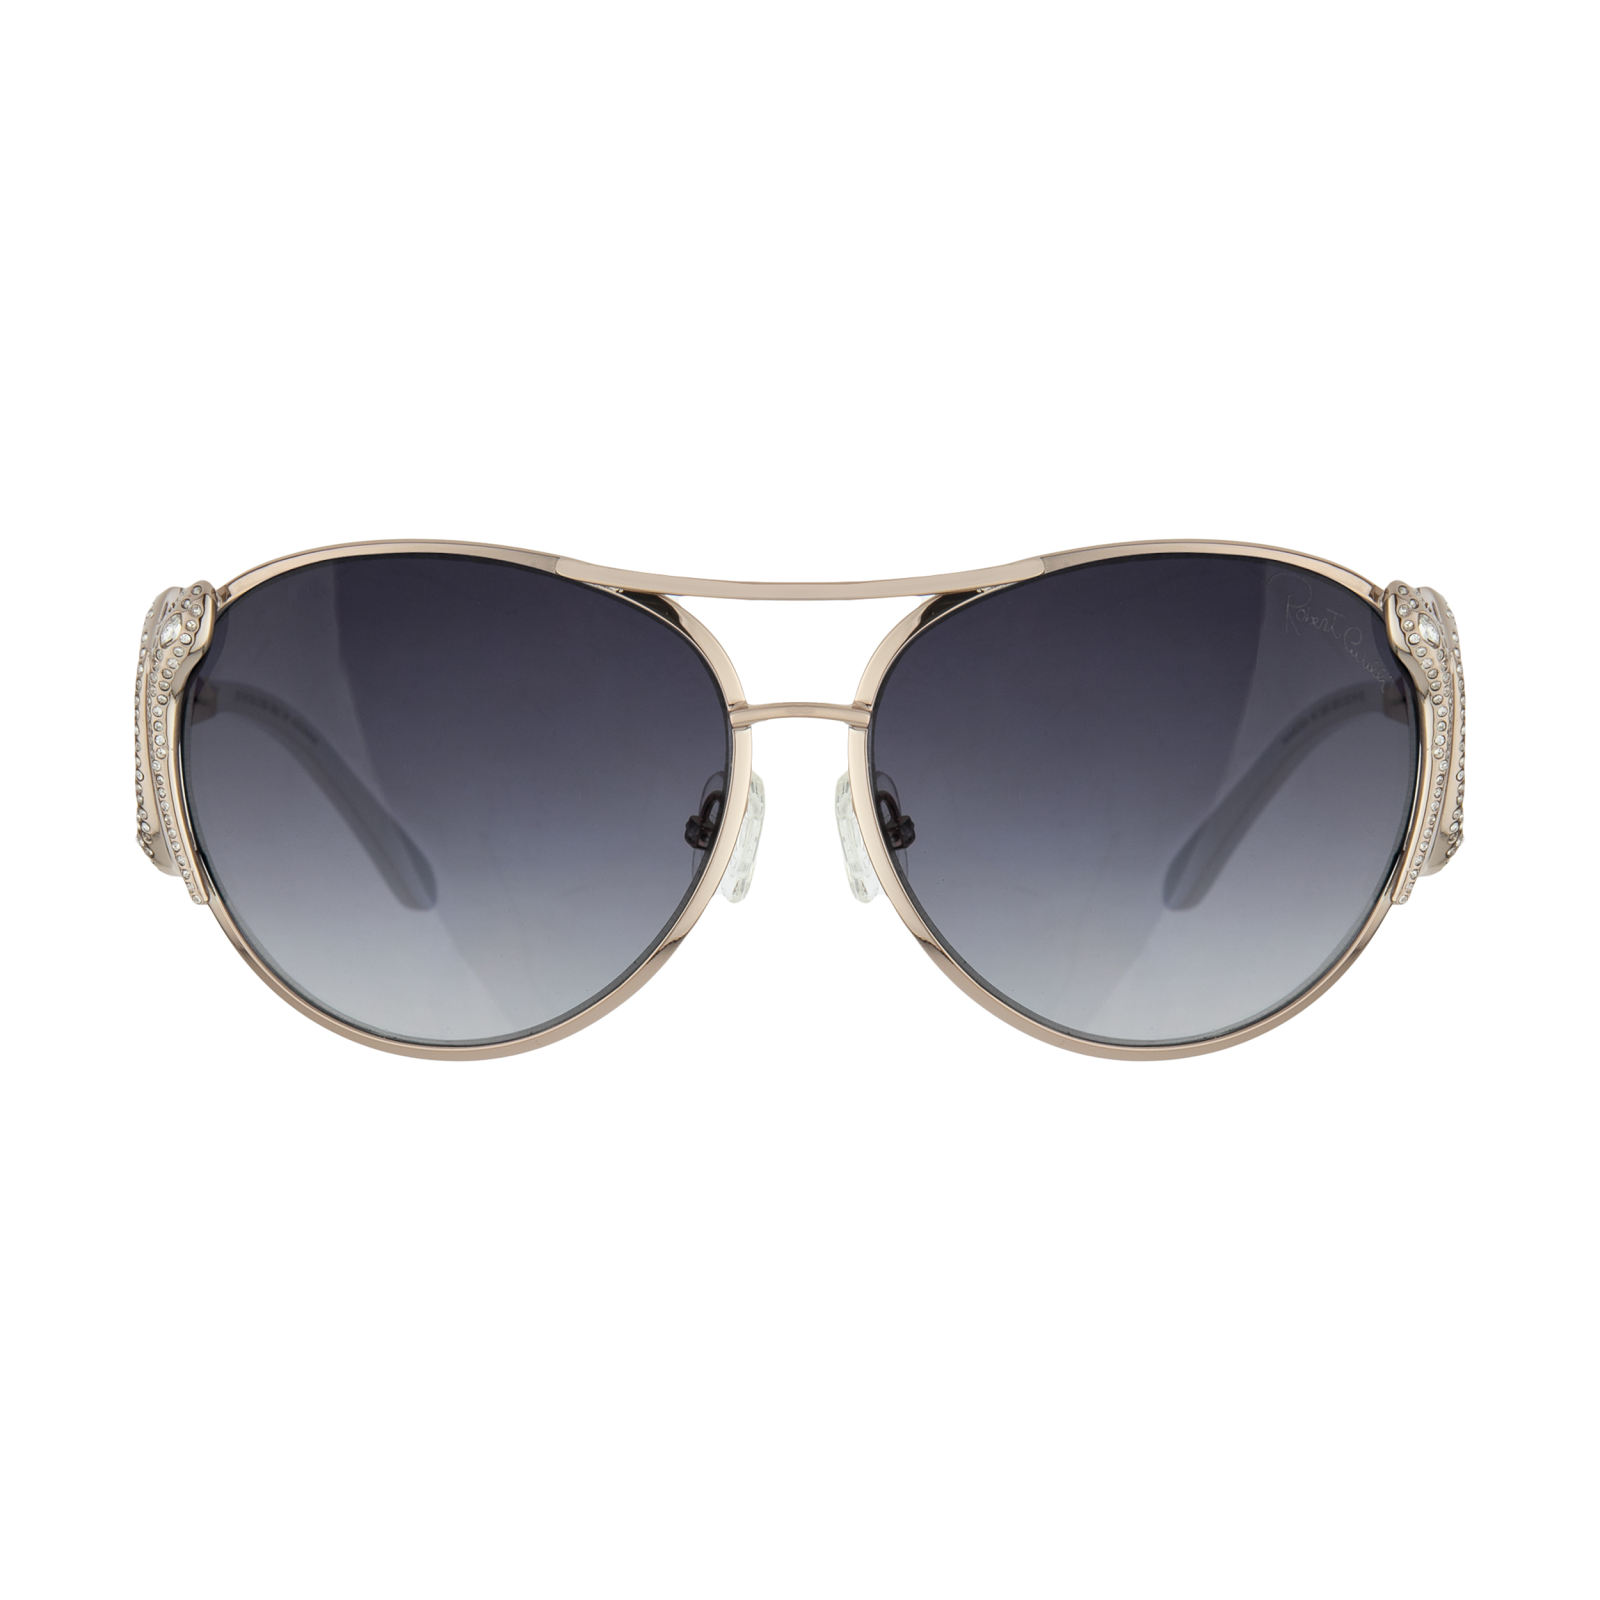 عینک آفتابی زنانه روبرتو کاوالی مدل 909 -  - 2